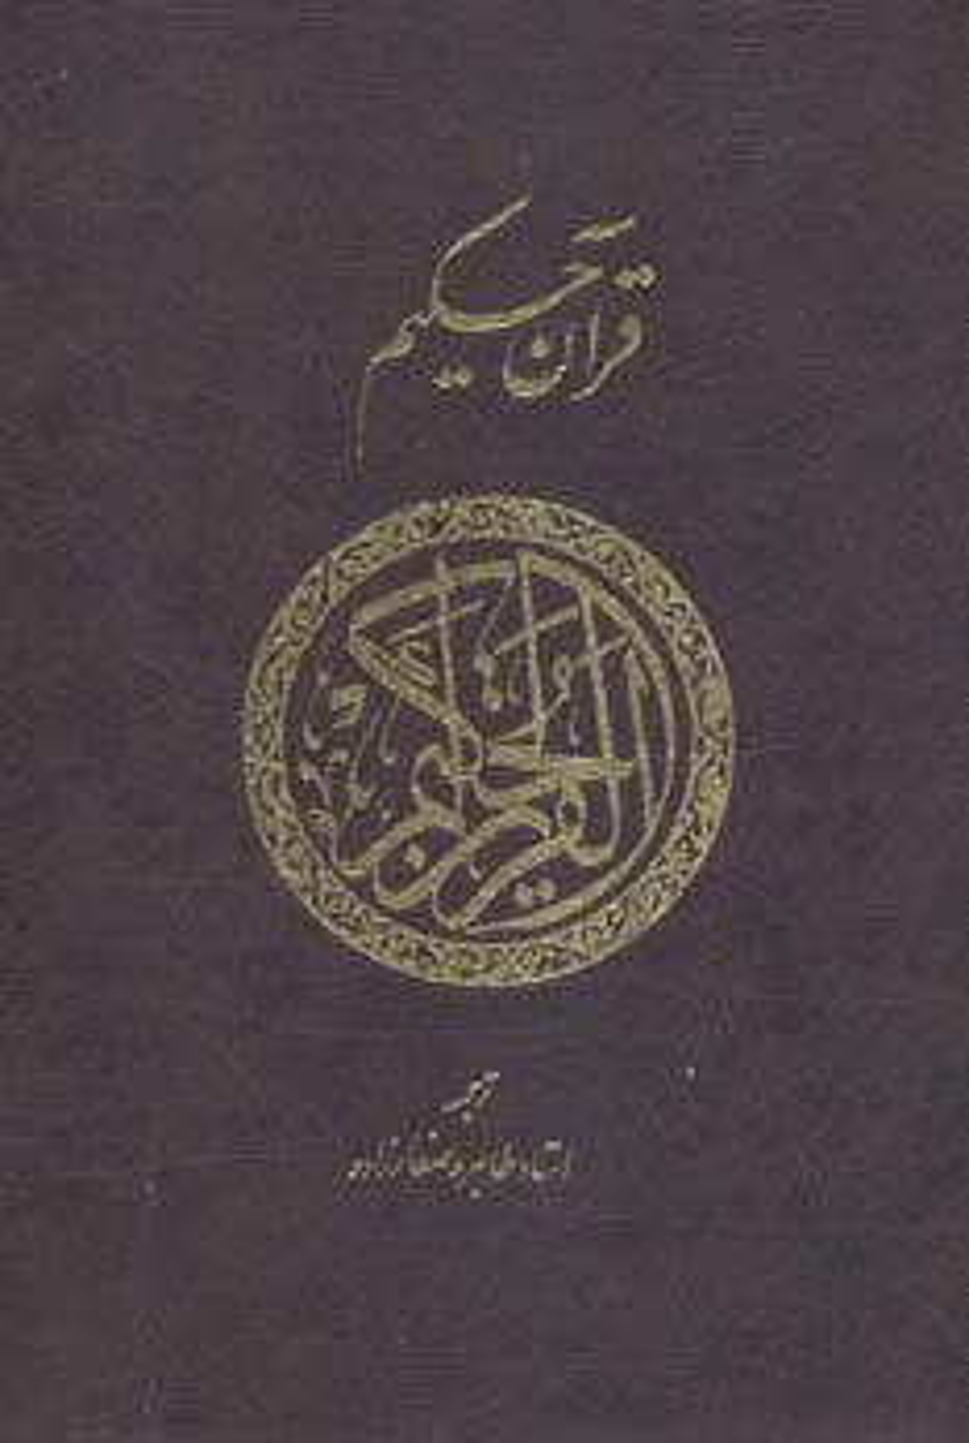 قرآن حکیم (بااندیکس،باقاب)